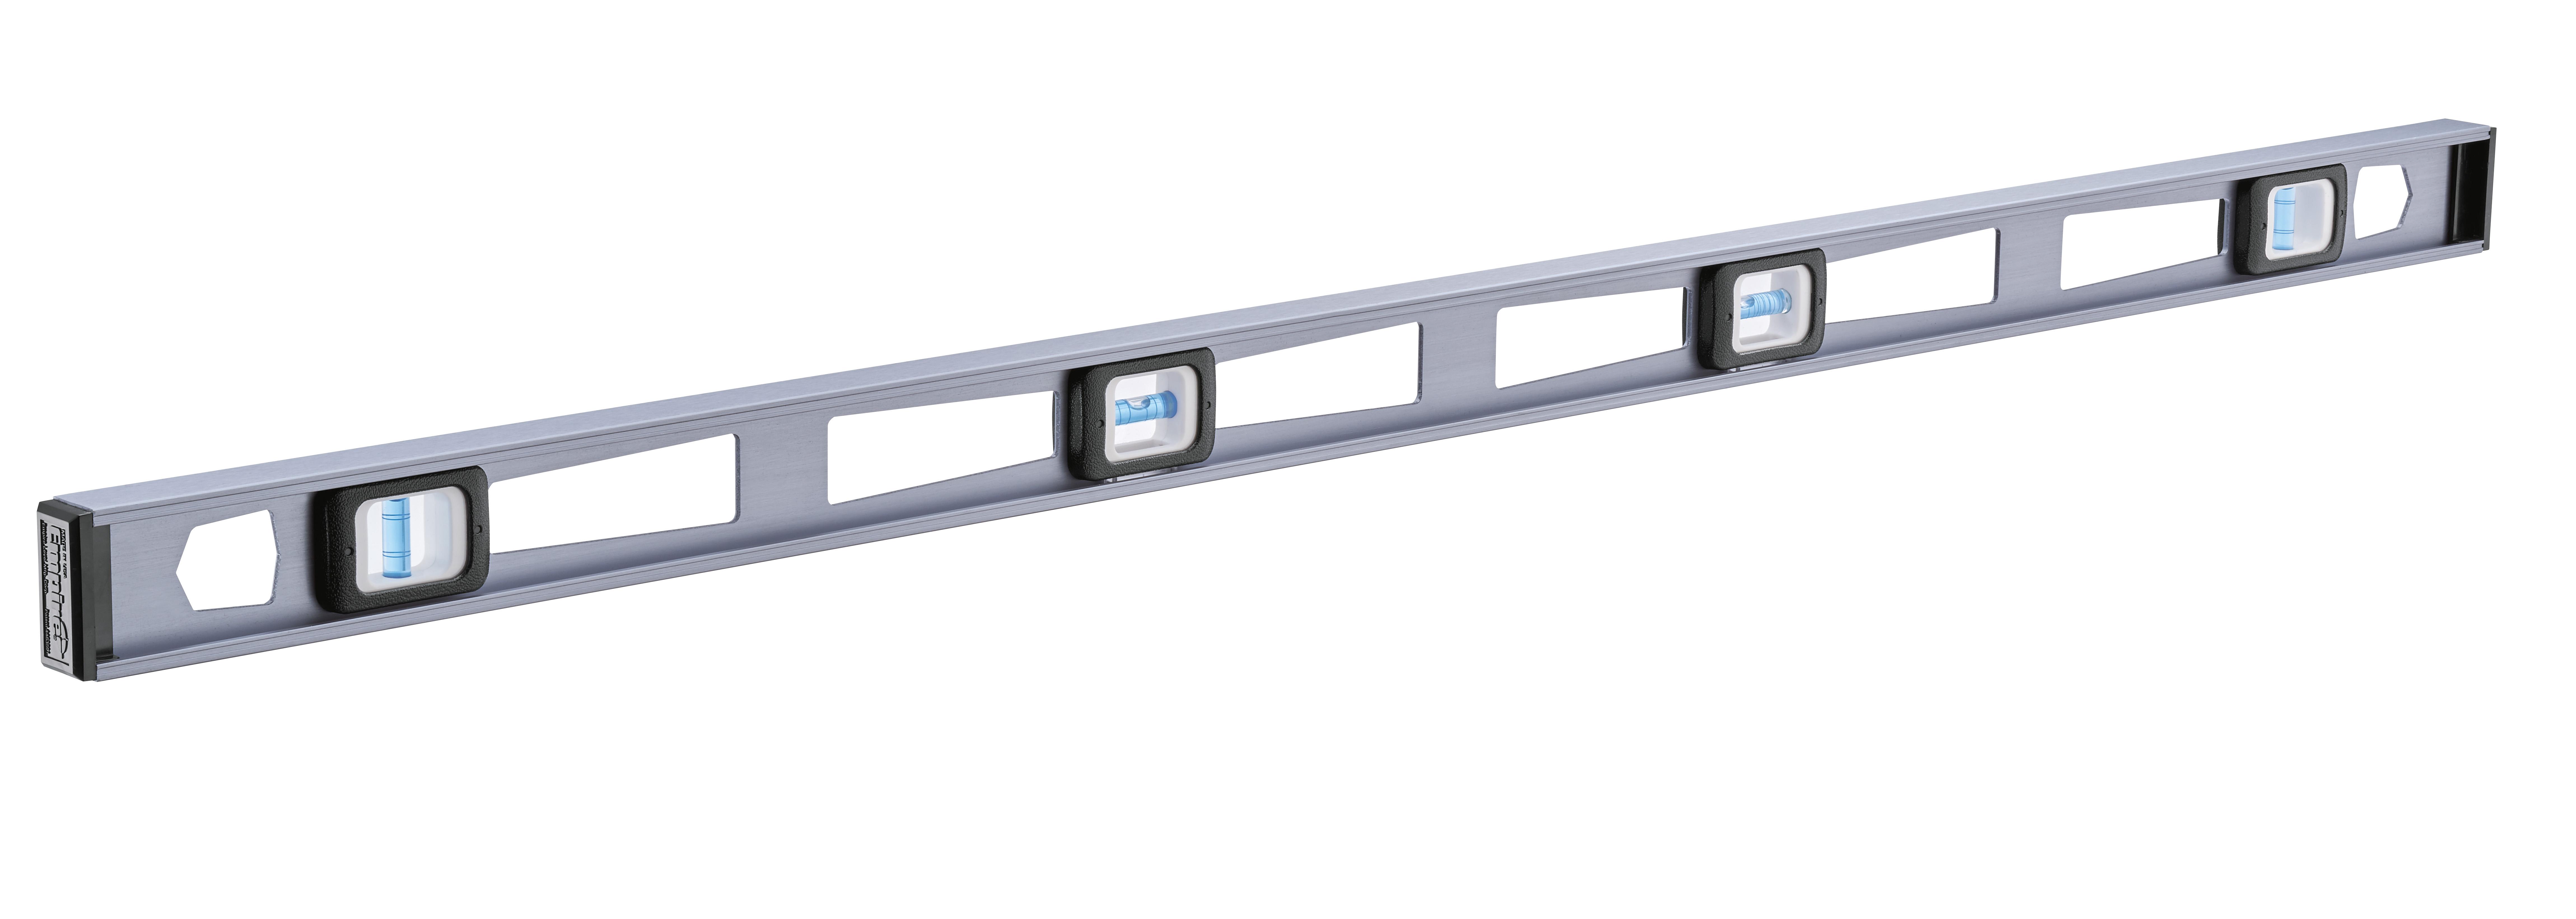 Milwaukee® Empire® TRUE BLUE® E80.48 Heavy Duty Non-Magnetic Professional I-Beam Level, 48 in L, 4 Vials, Aluminum, (2) Level, (2) Plumb Vial Position, 0.0005 in